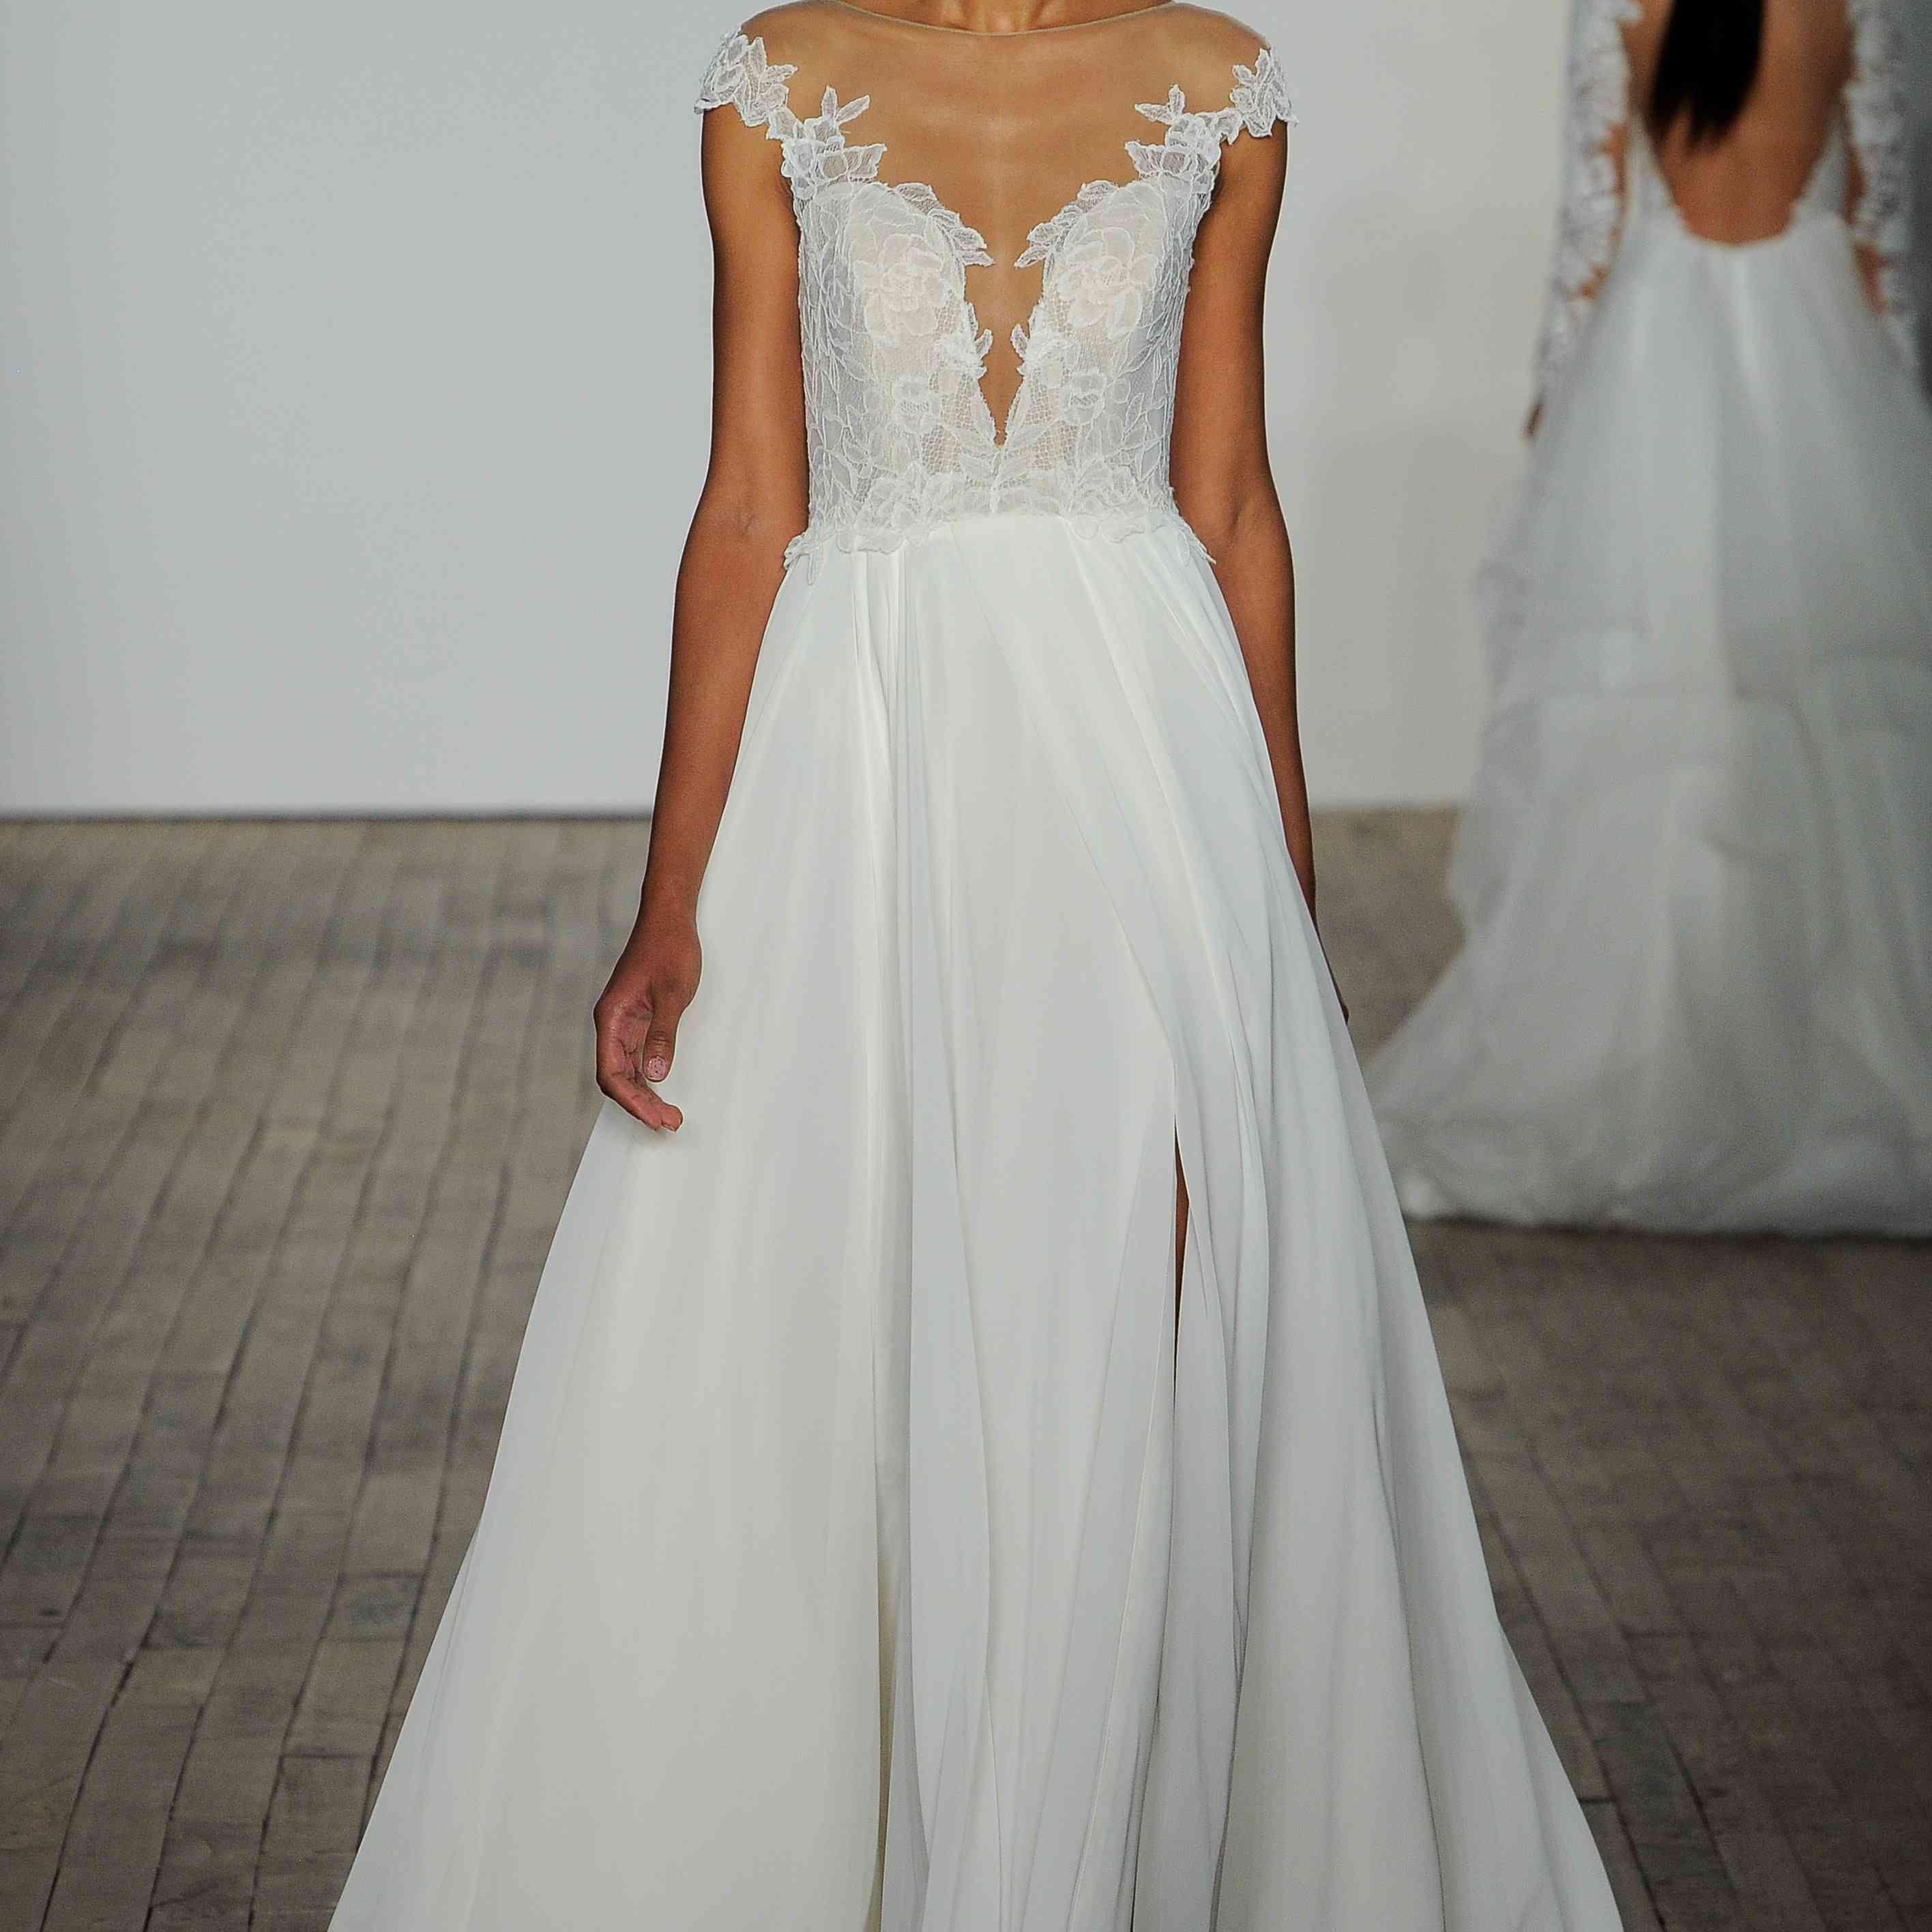 Soleil short sleeve wedding dress